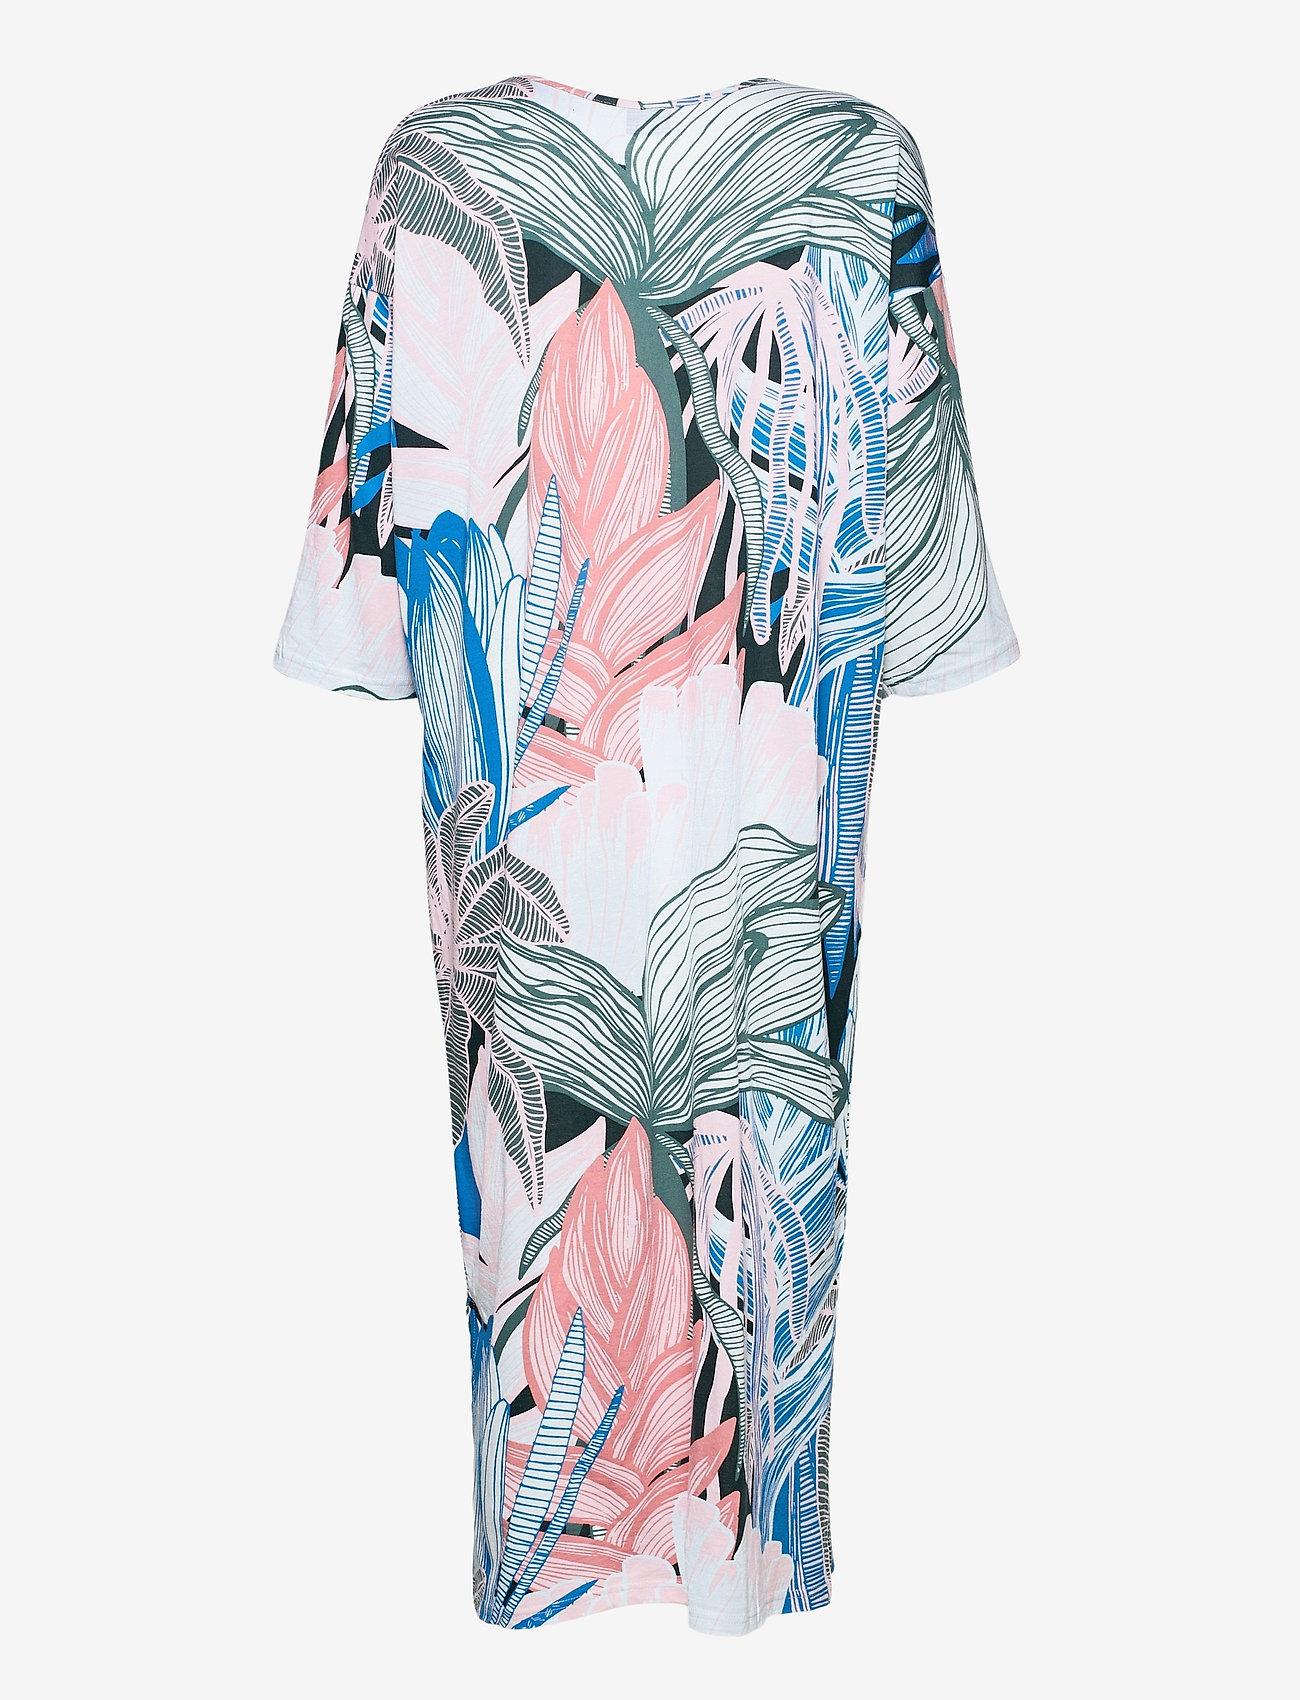 Nanso - Ladies kaftan, Tropiikki - nightdresses - multi-coloured - 1